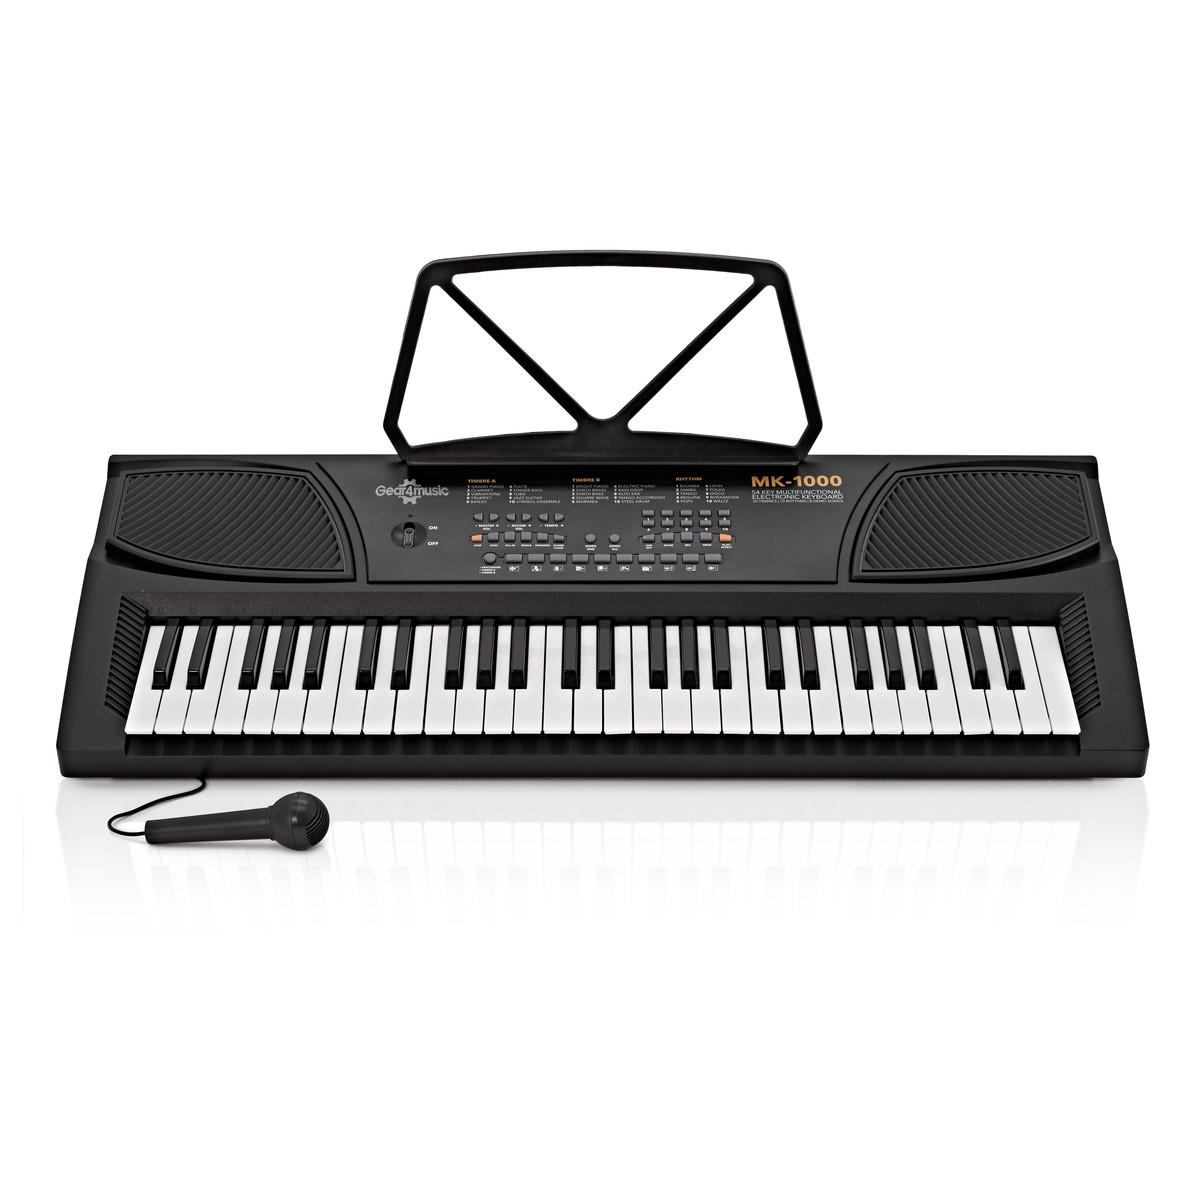 Shop now | MK-1000 54-Key Portable Keyboard By Gear4music